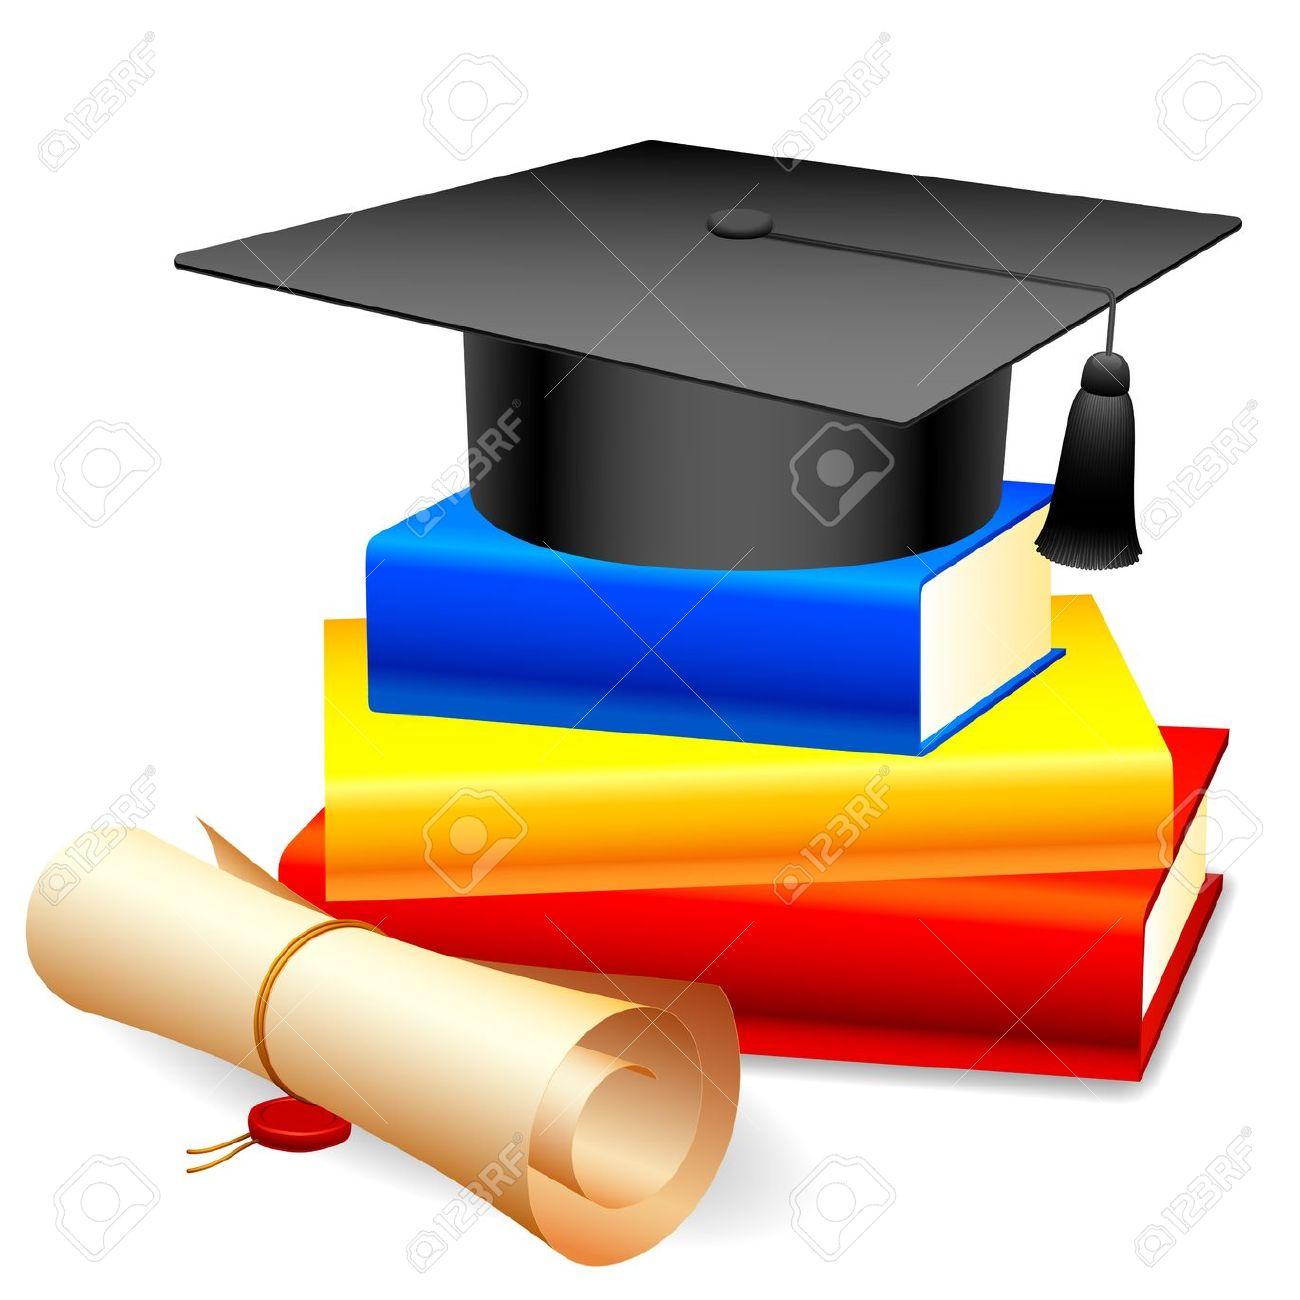 Diploma Clipart - Clipartion.-Diploma Clipart - Clipartion.-5